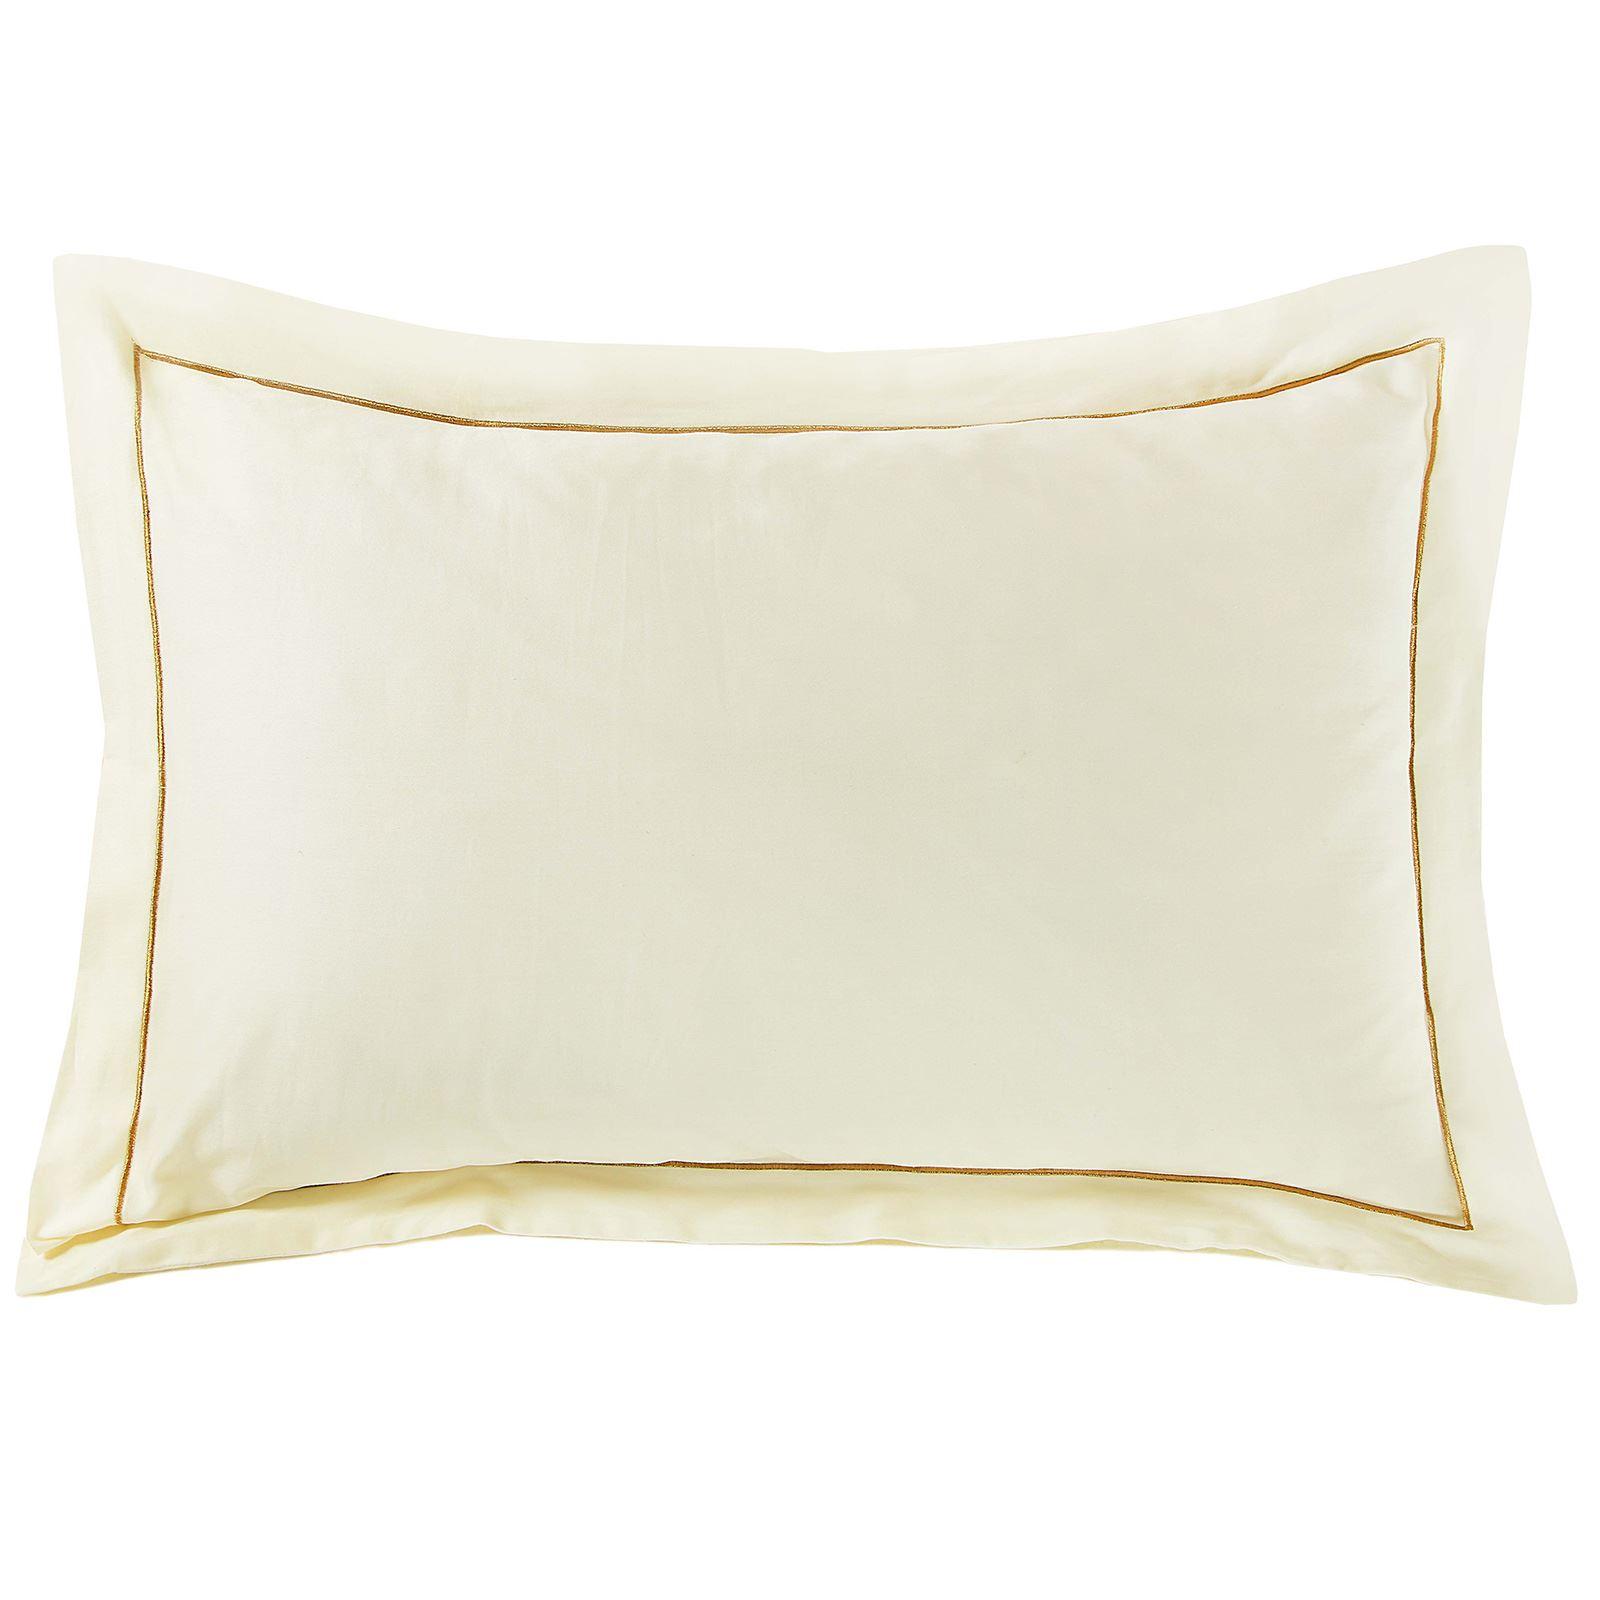 100-algodon-egipcio-de-lujo-a-rayas-Satin-funda-de-edredon-cabido-hoja-plana-Cenefa miniatura 23